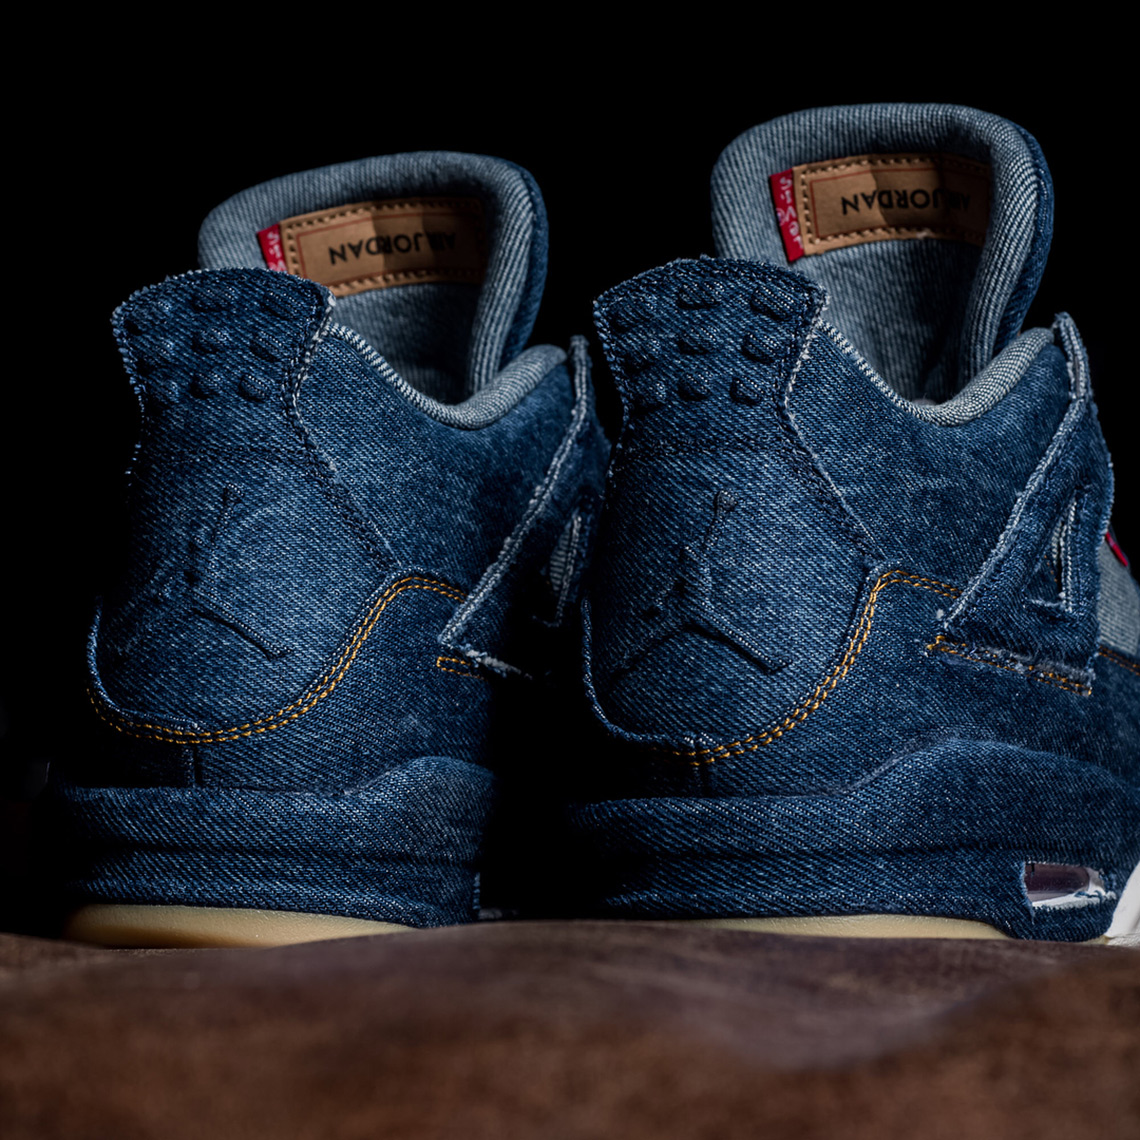 newest collection 12b81 b6b8f The Levi s x Air Jordan 4 Release Details - SneakerNews.com